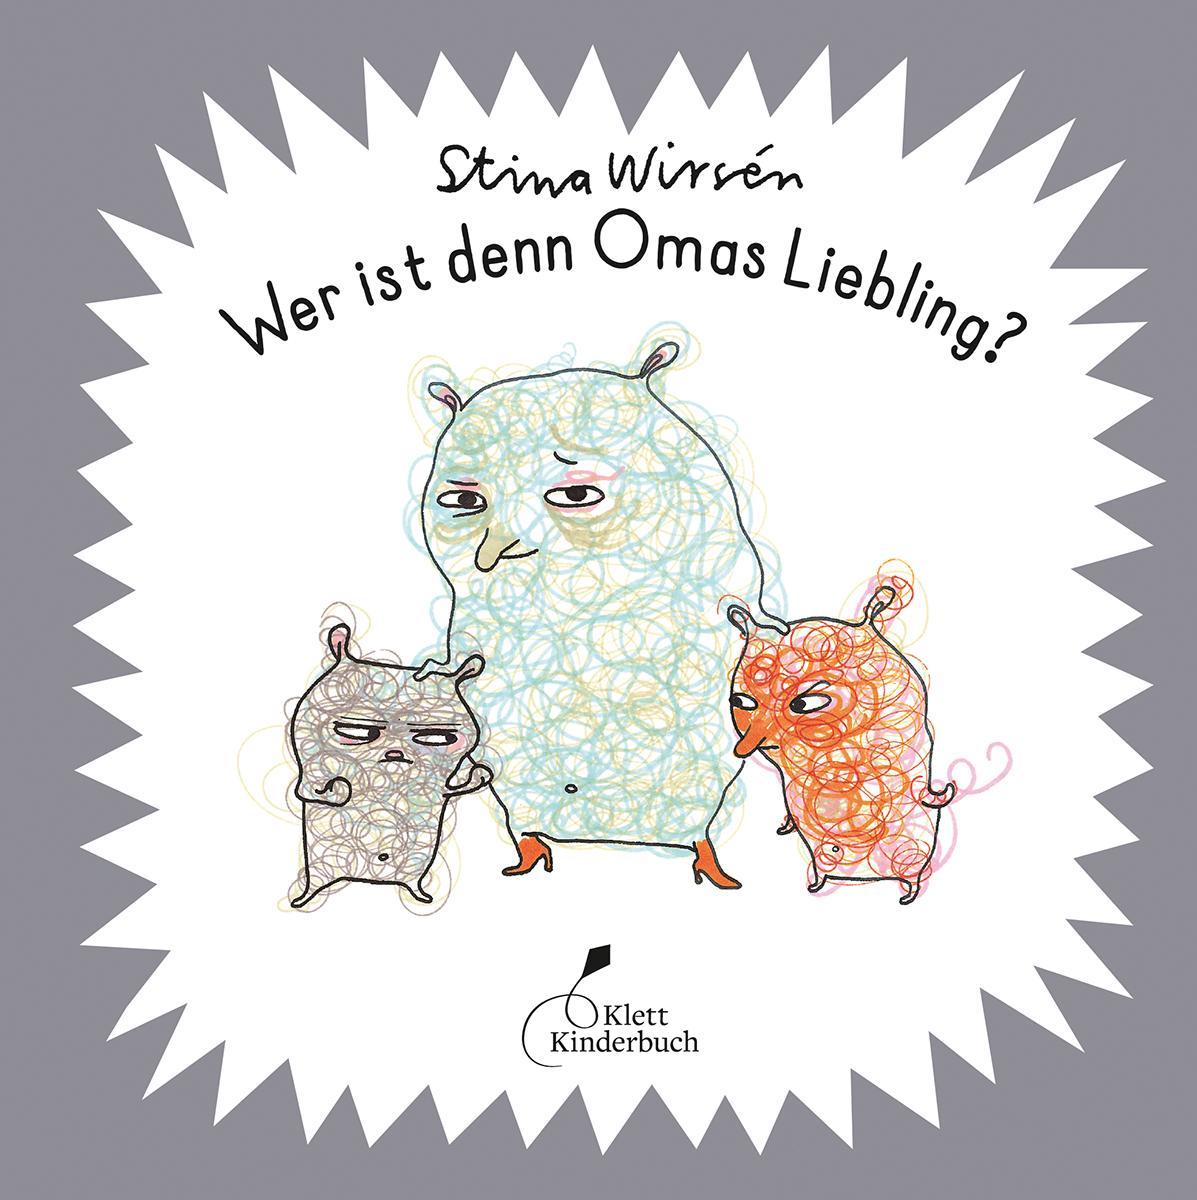 Wer ist denn Omas Liebling?